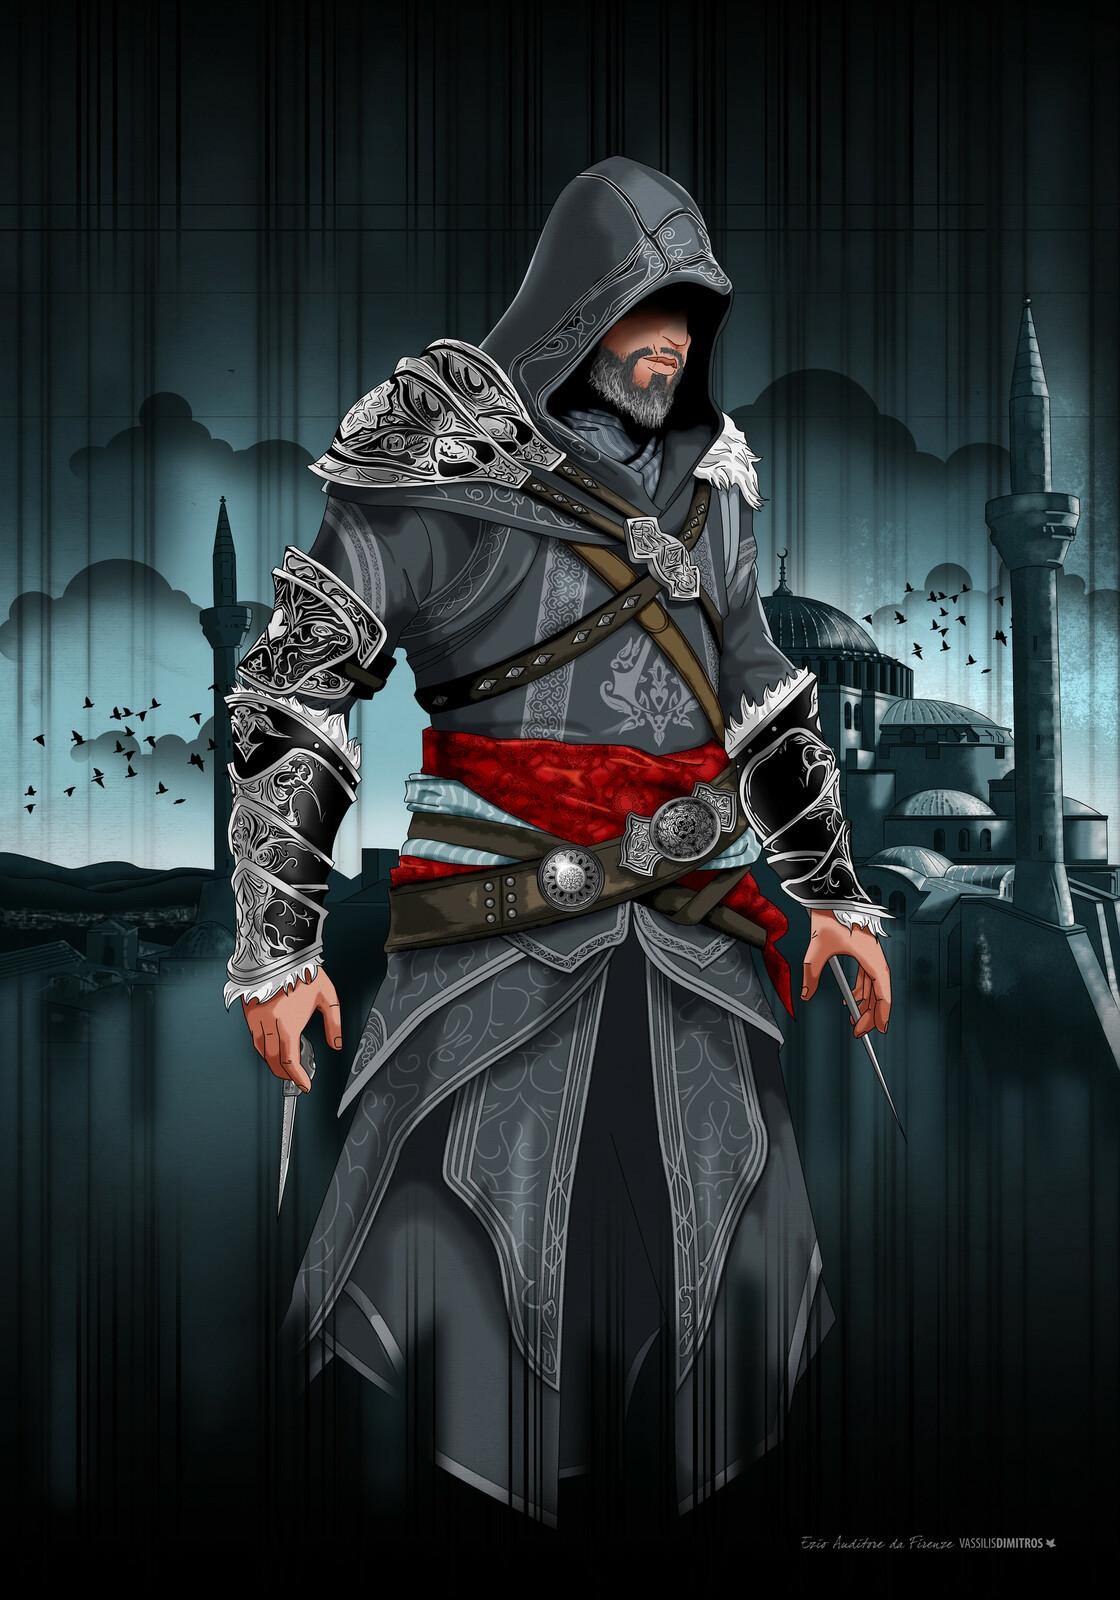 Ezio Auditore Da Firenze (Kostantiniyye 1511)